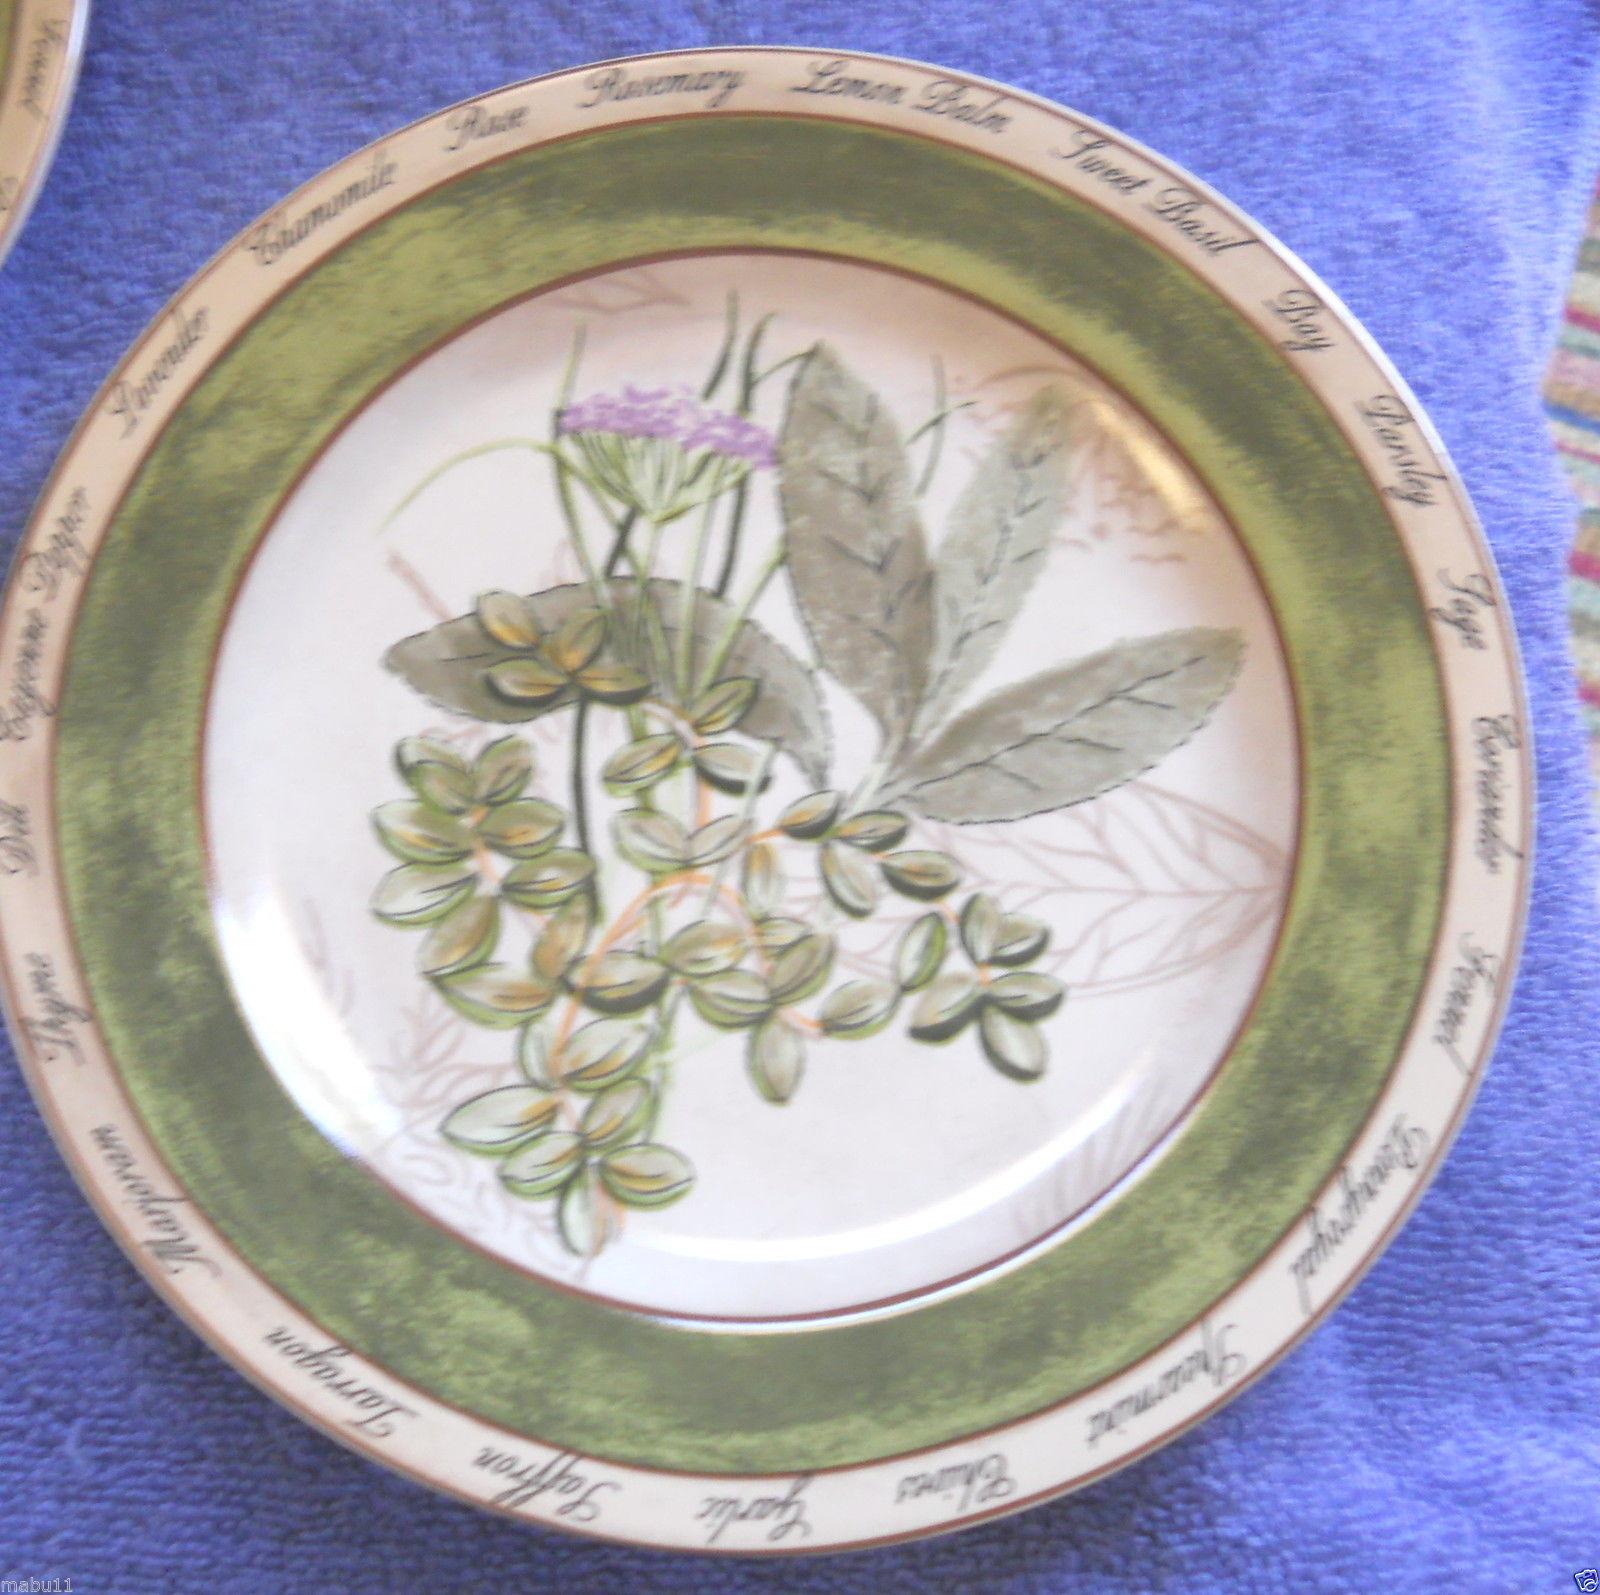 American Atlier Bouquet Garni salad plate mint basil - $3.91